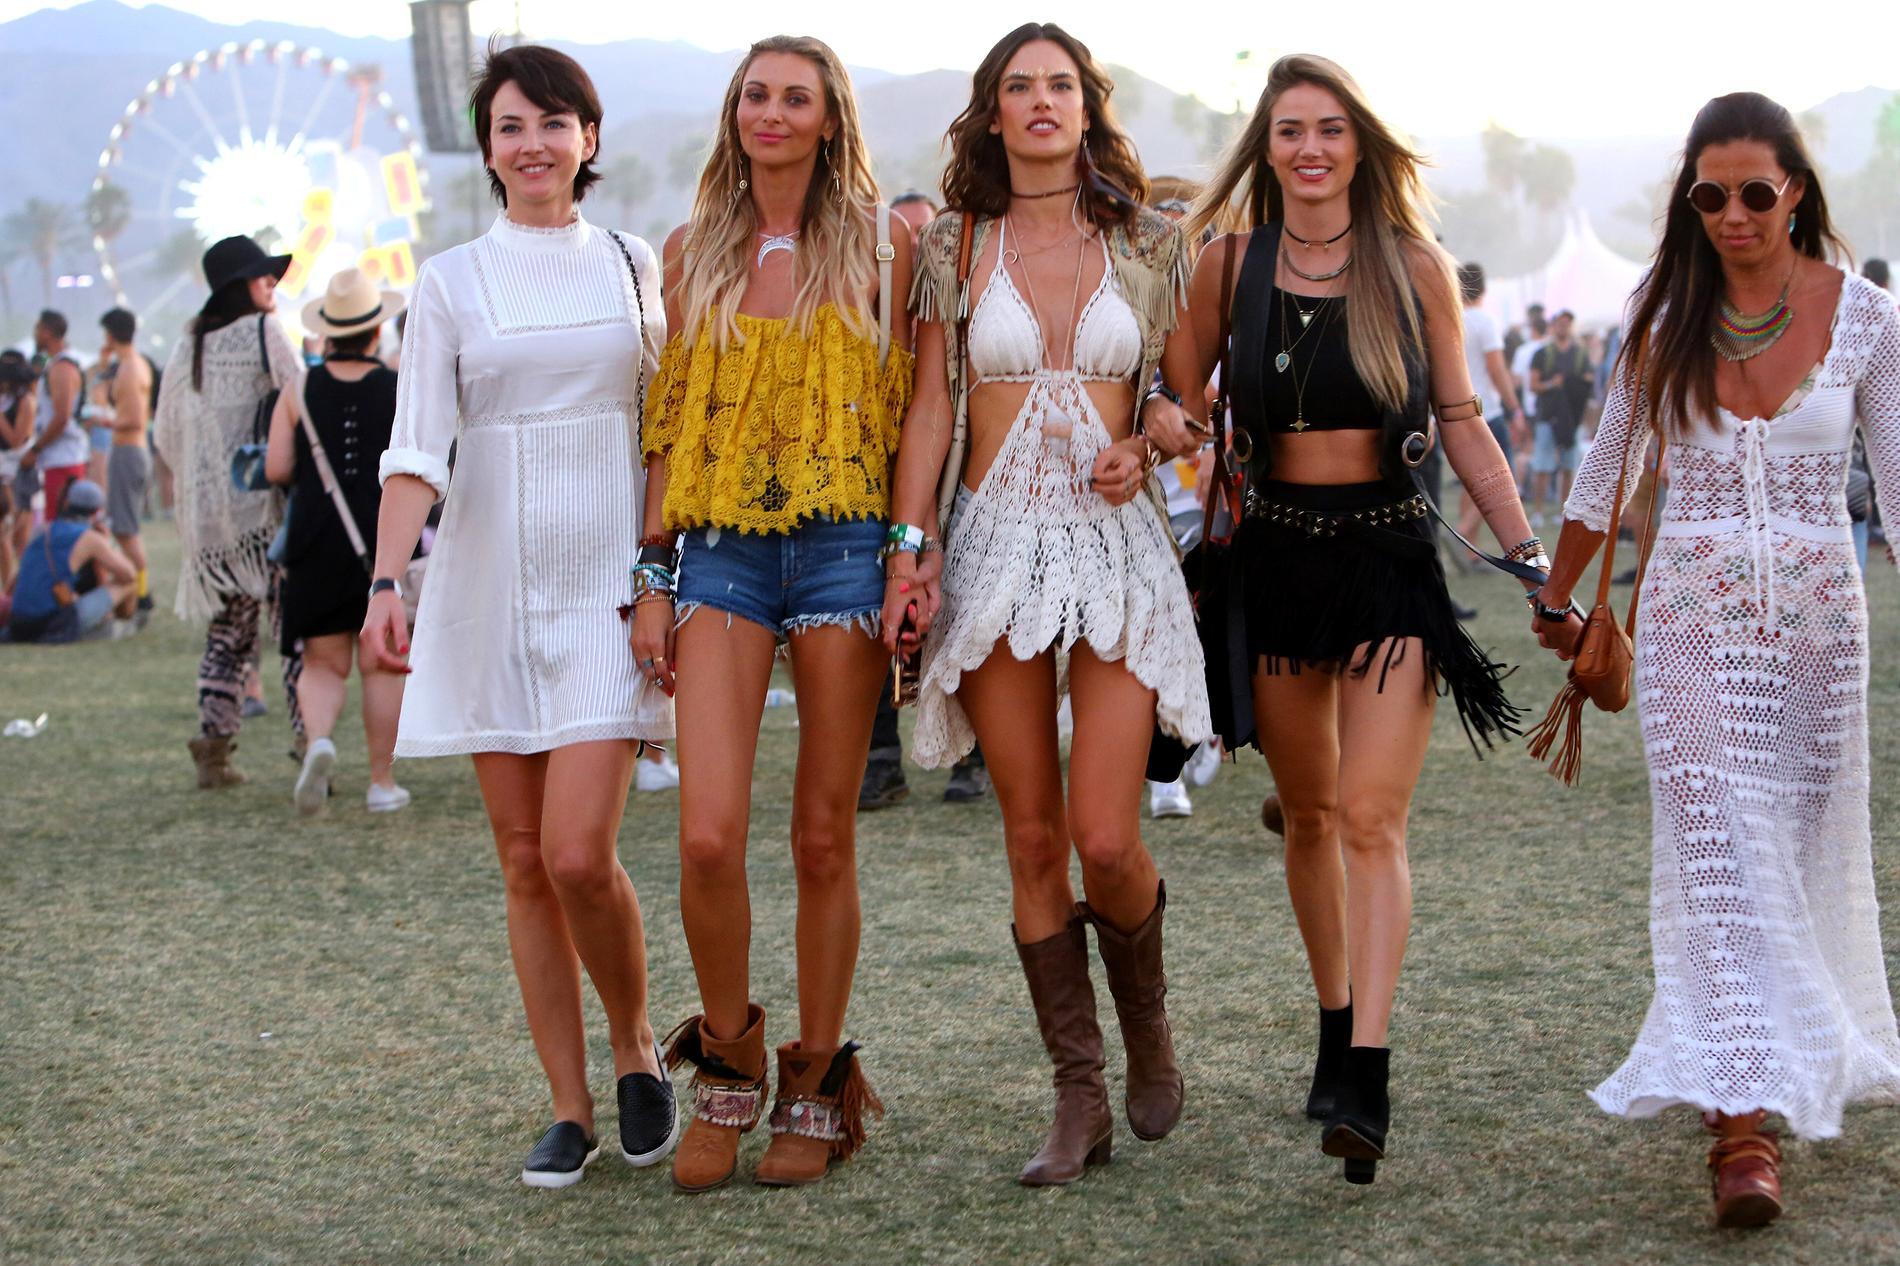 festival de Coachella 2017